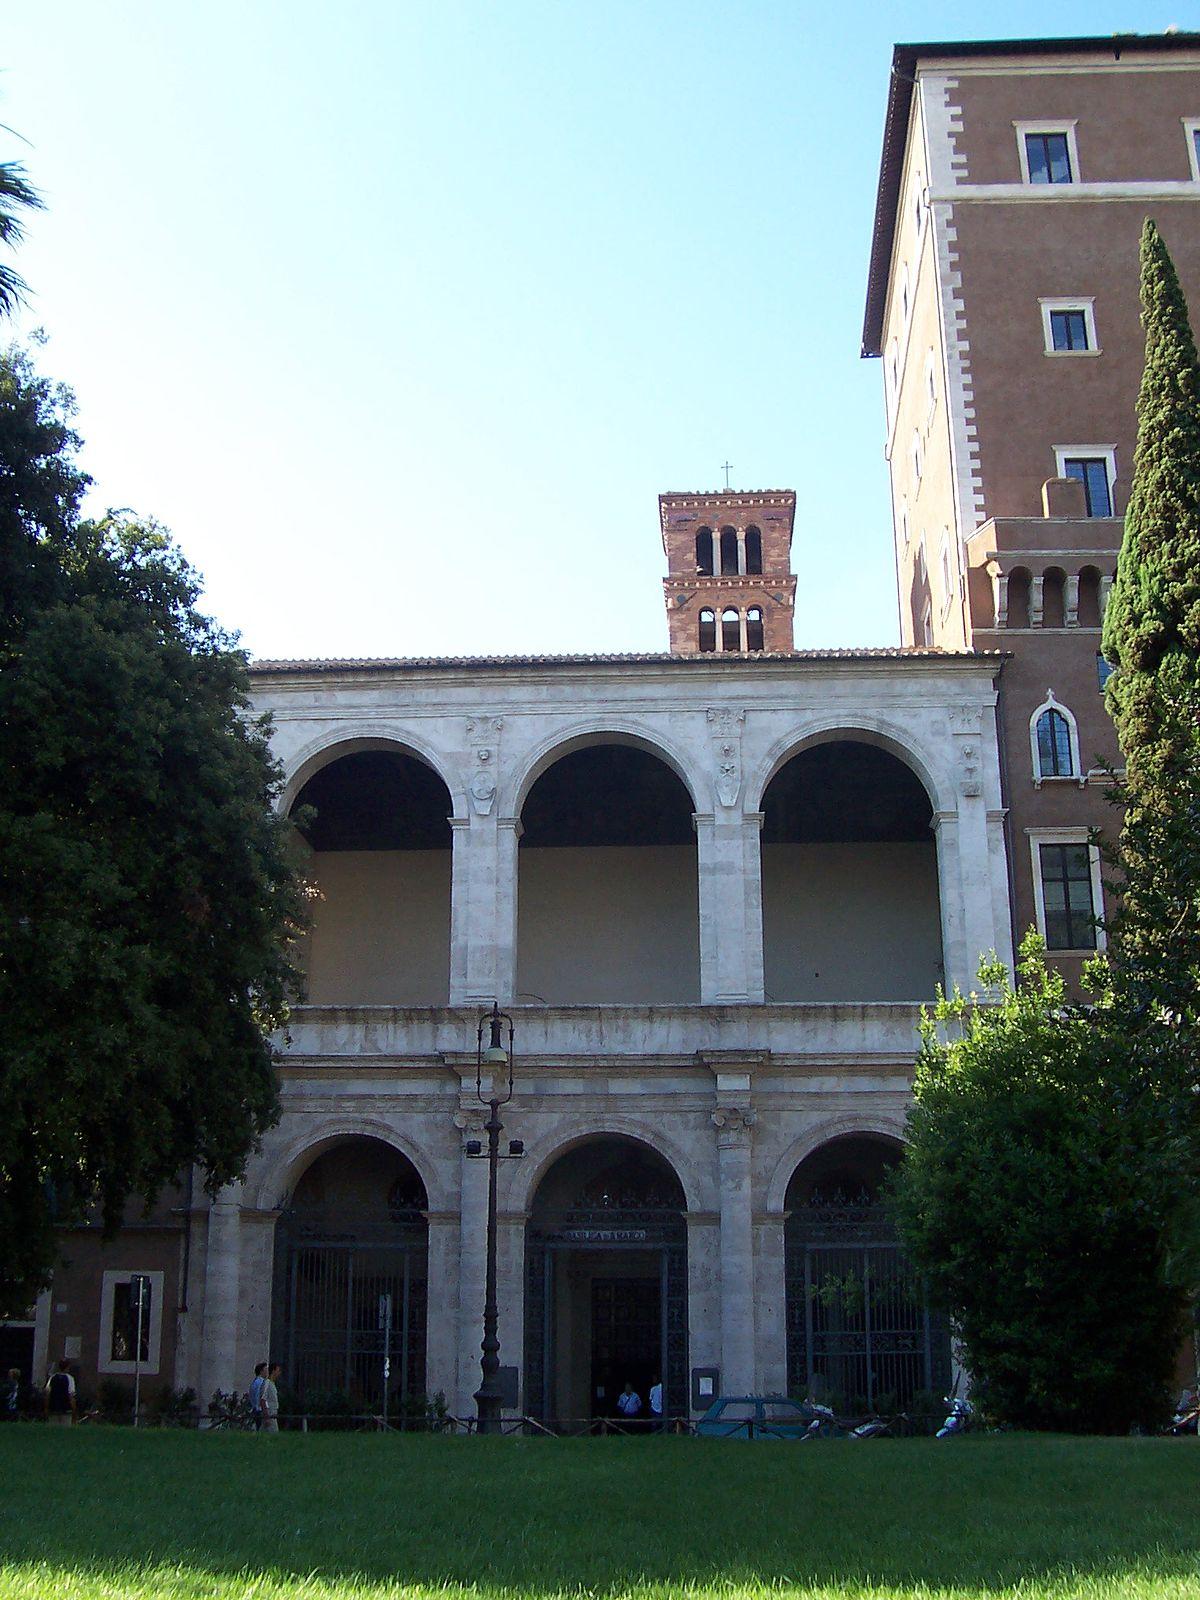 Basilica di san marco evangelista al campidoglio wikipedia for Esterno basilica di san marco